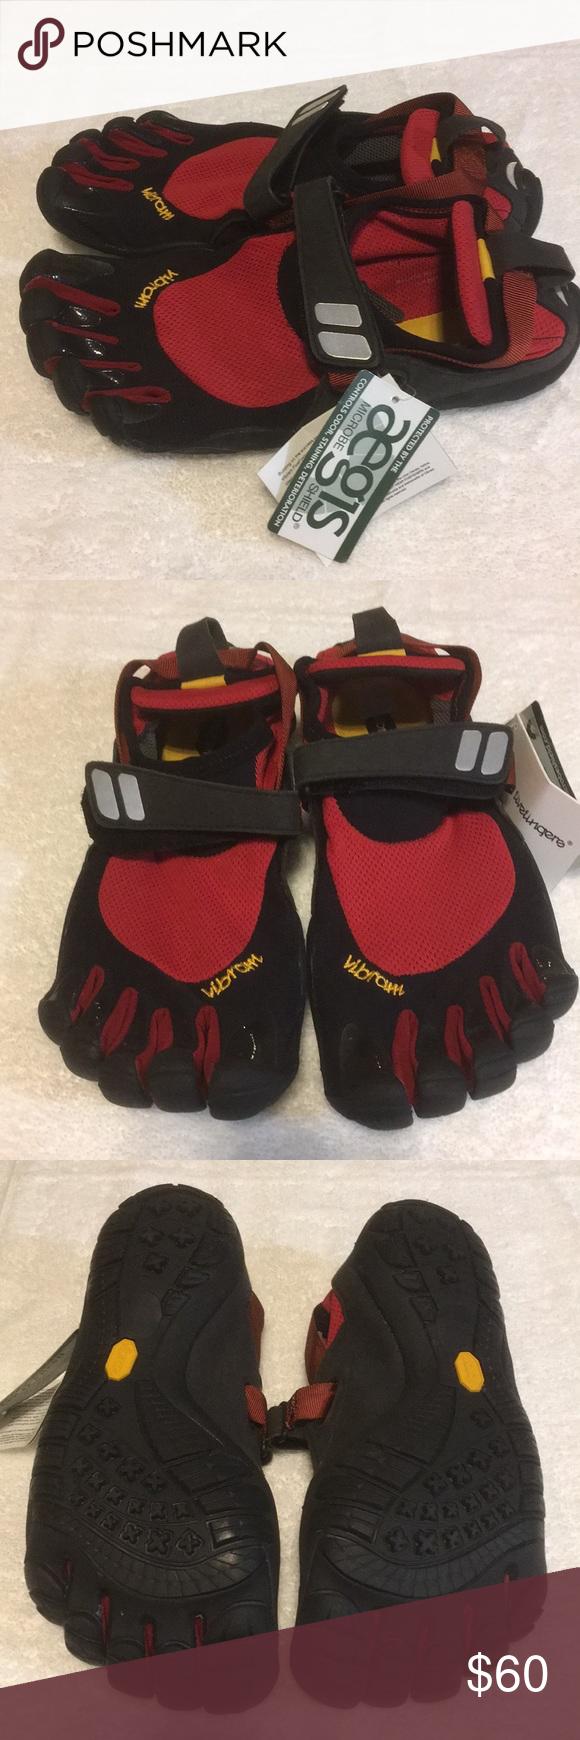 reputable site 9027b 611f8 ... coupon for wholesale vibram fivefingers treksport red black vibram  fivefingers mens treksport red black vibram shoes